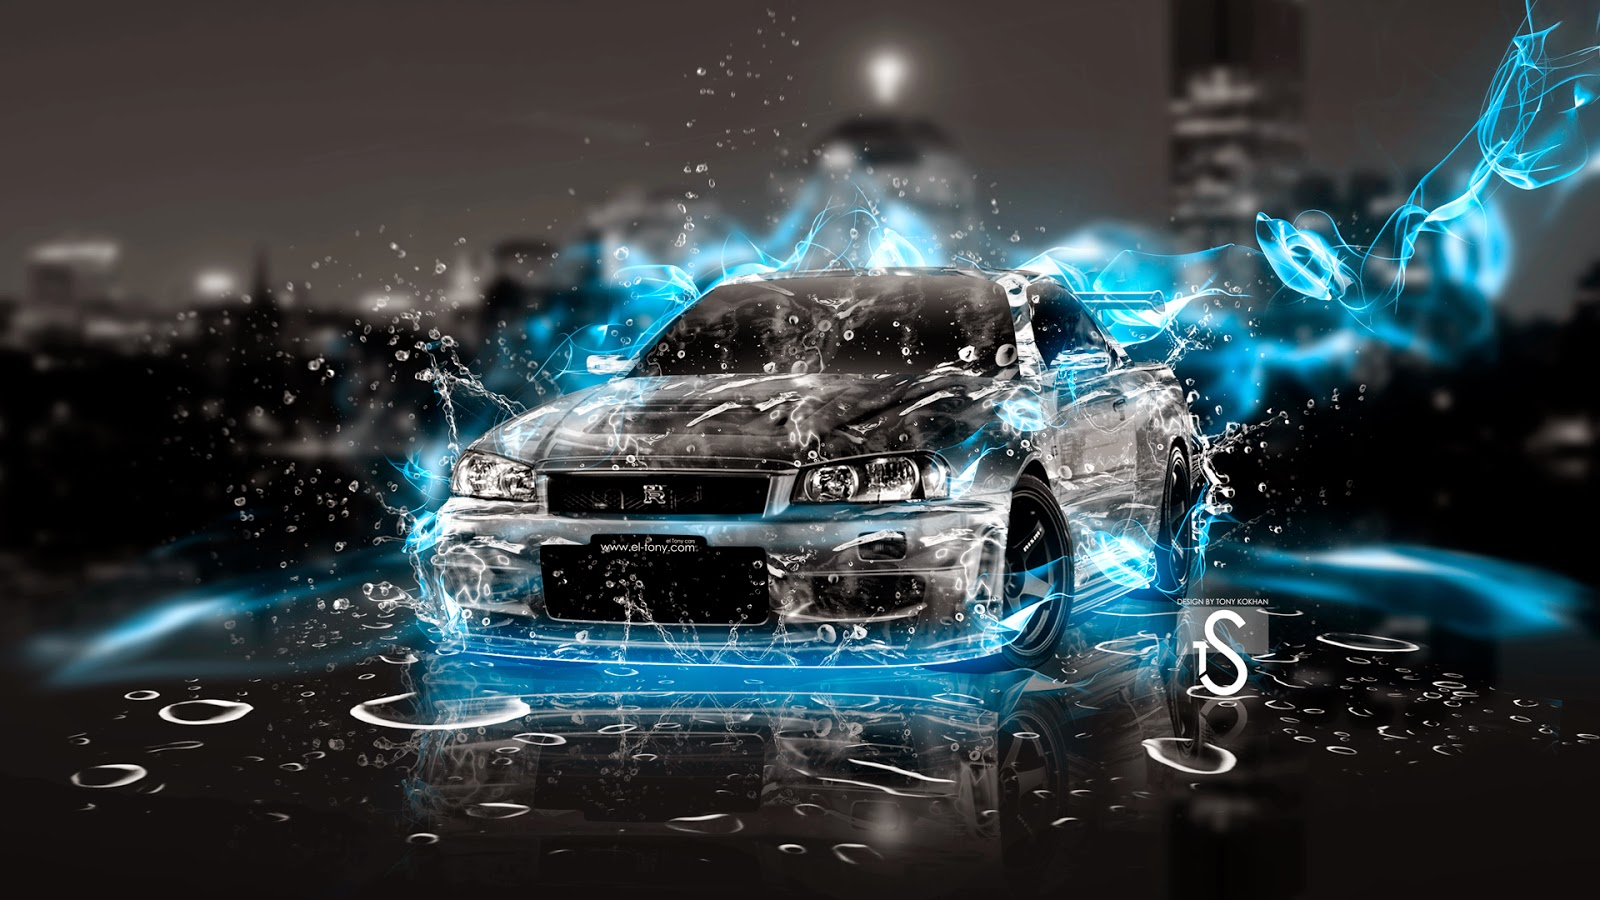 Hd wallpapers cars vol xviii car reviews hd wallpapers cars vol xviii voltagebd Image collections